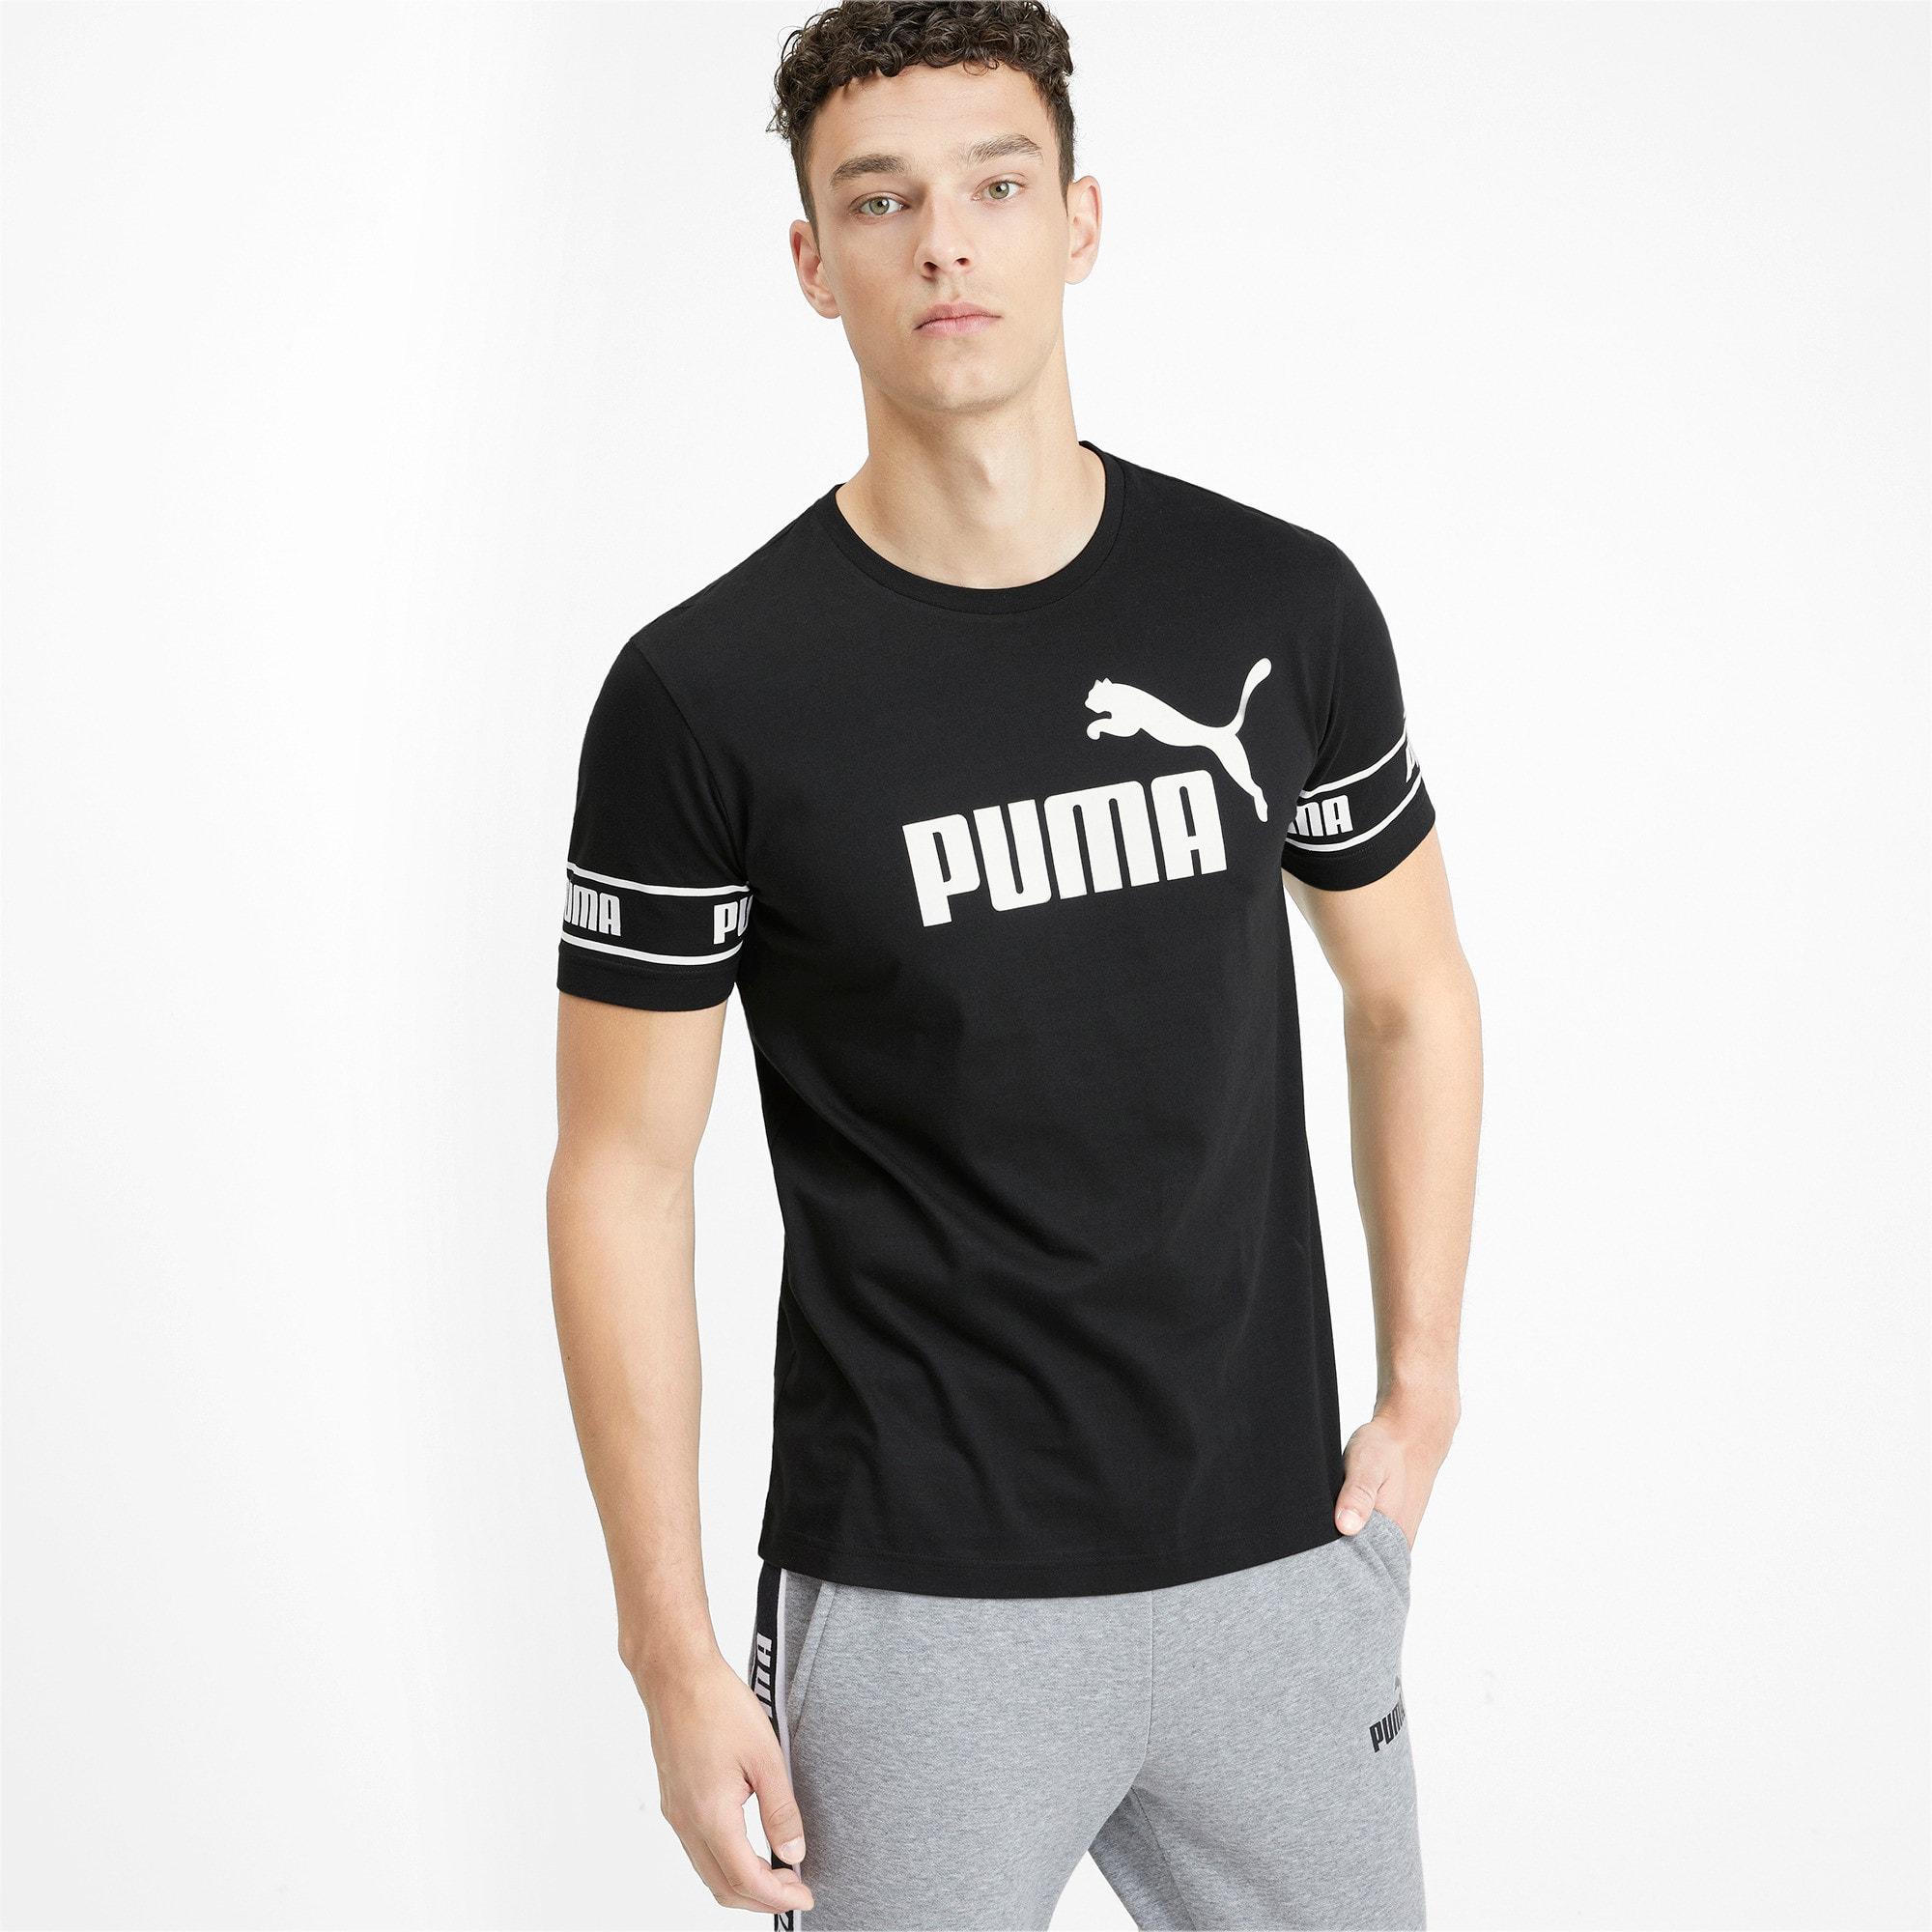 Miniaturka 1 Męska koszulka Amplified, Puma Black, średnie